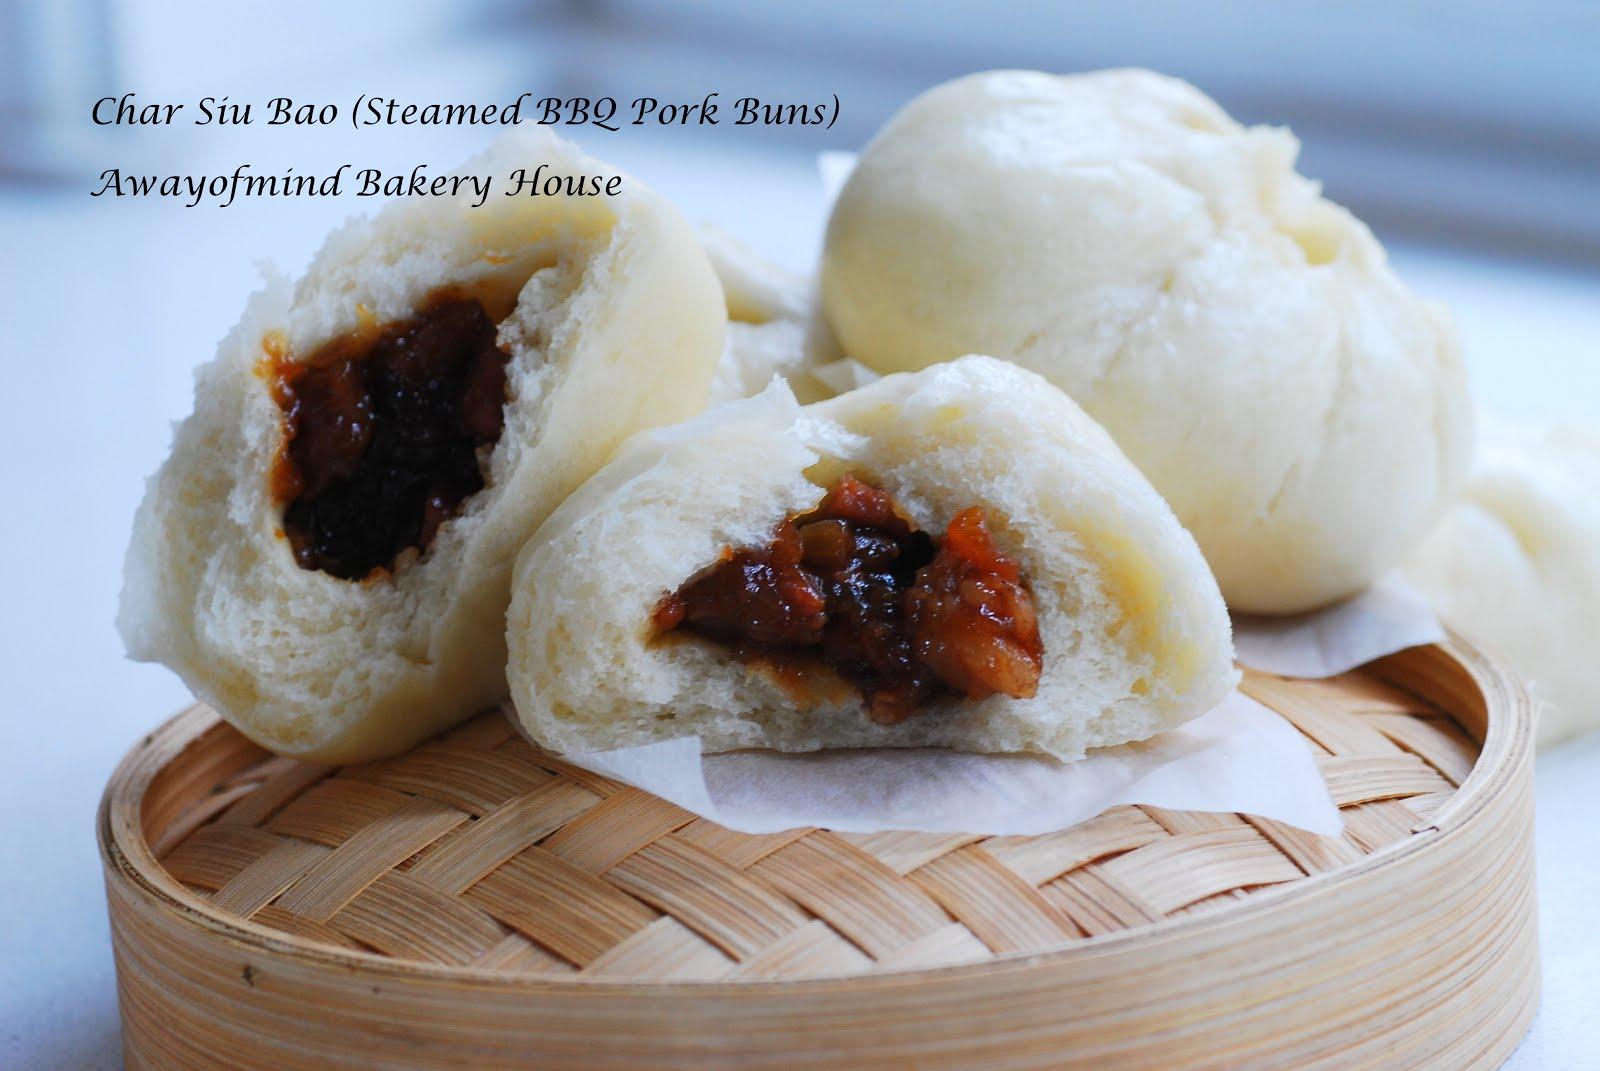 Char Siu Bao (Steamed BBQ Pork Bun)